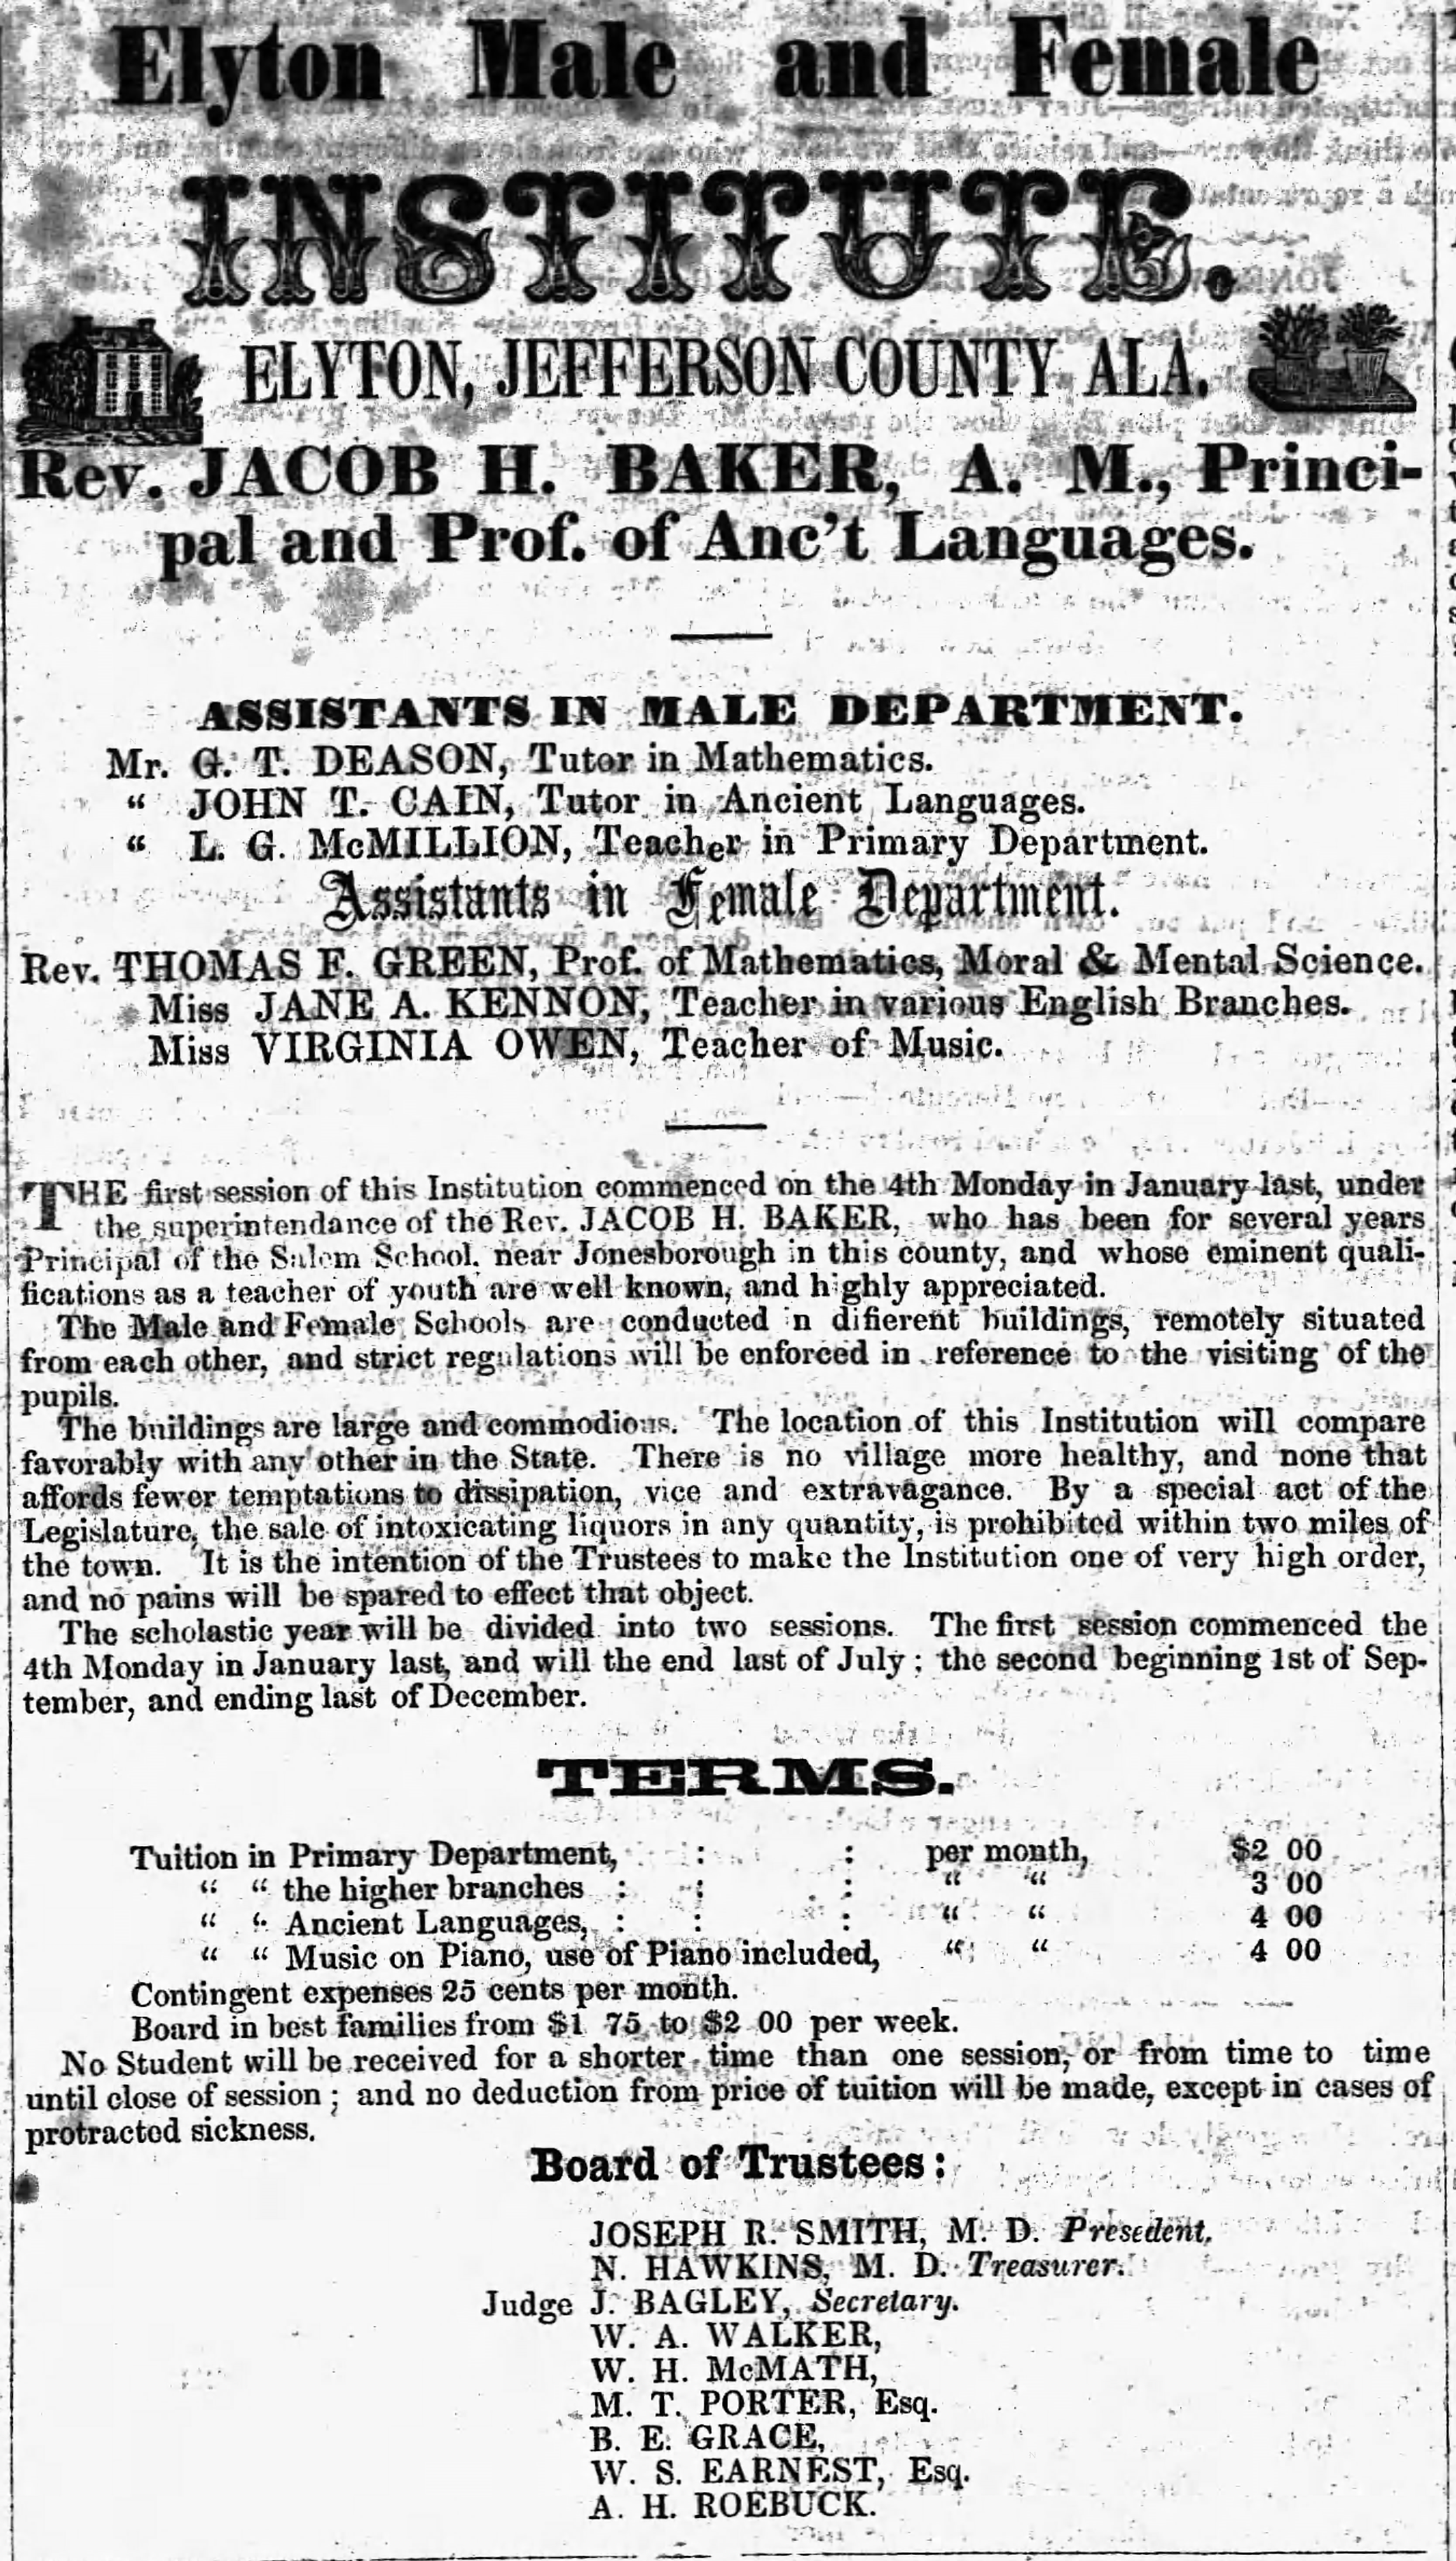 Patron+ Elyton, a description of the Elyton Male & Female Institute from 1854 news article!